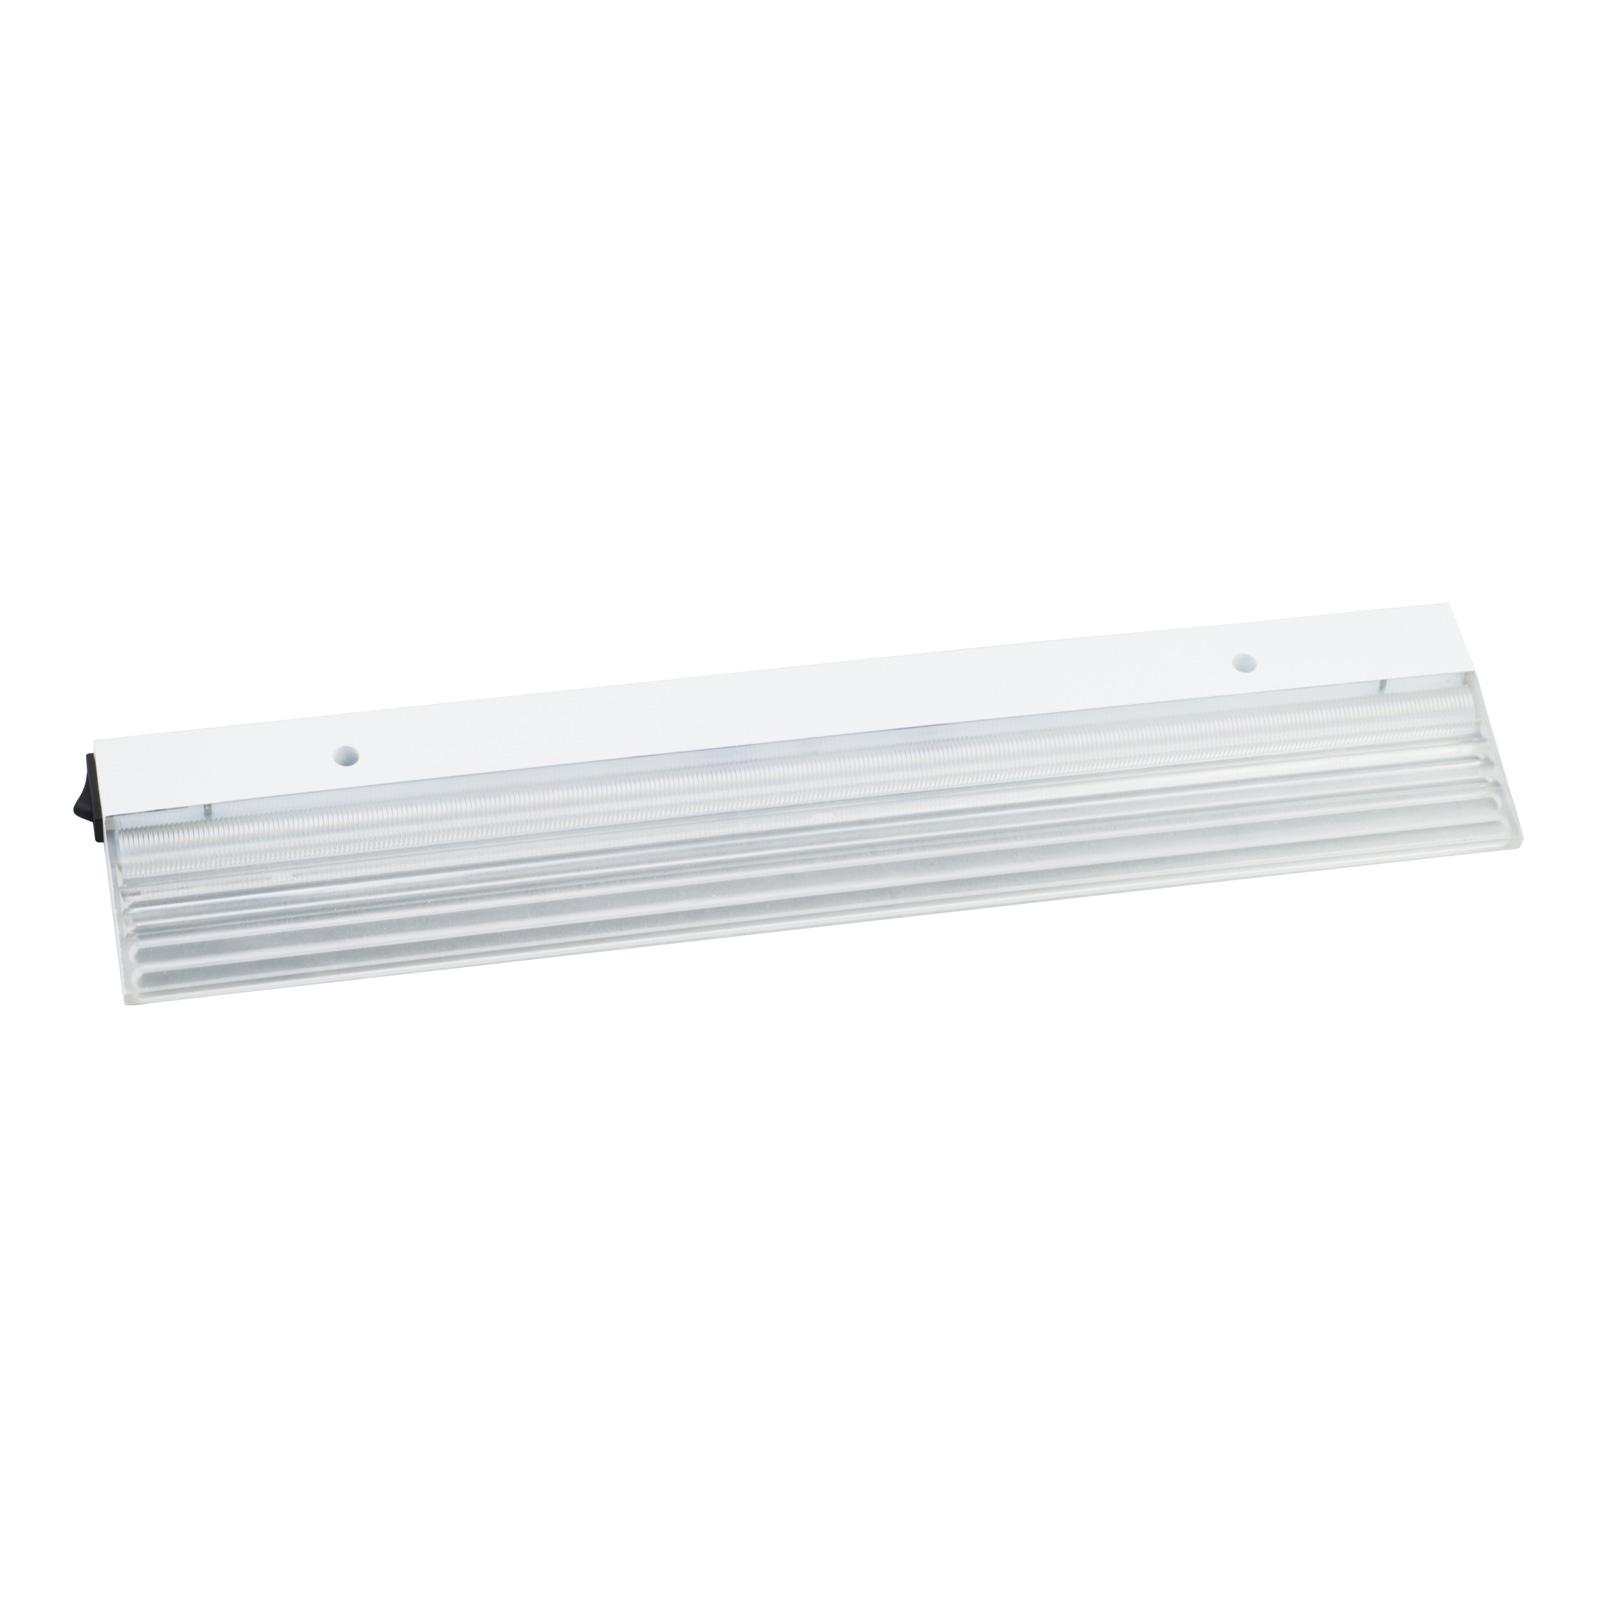 LED-bänklampa Unta Acryl